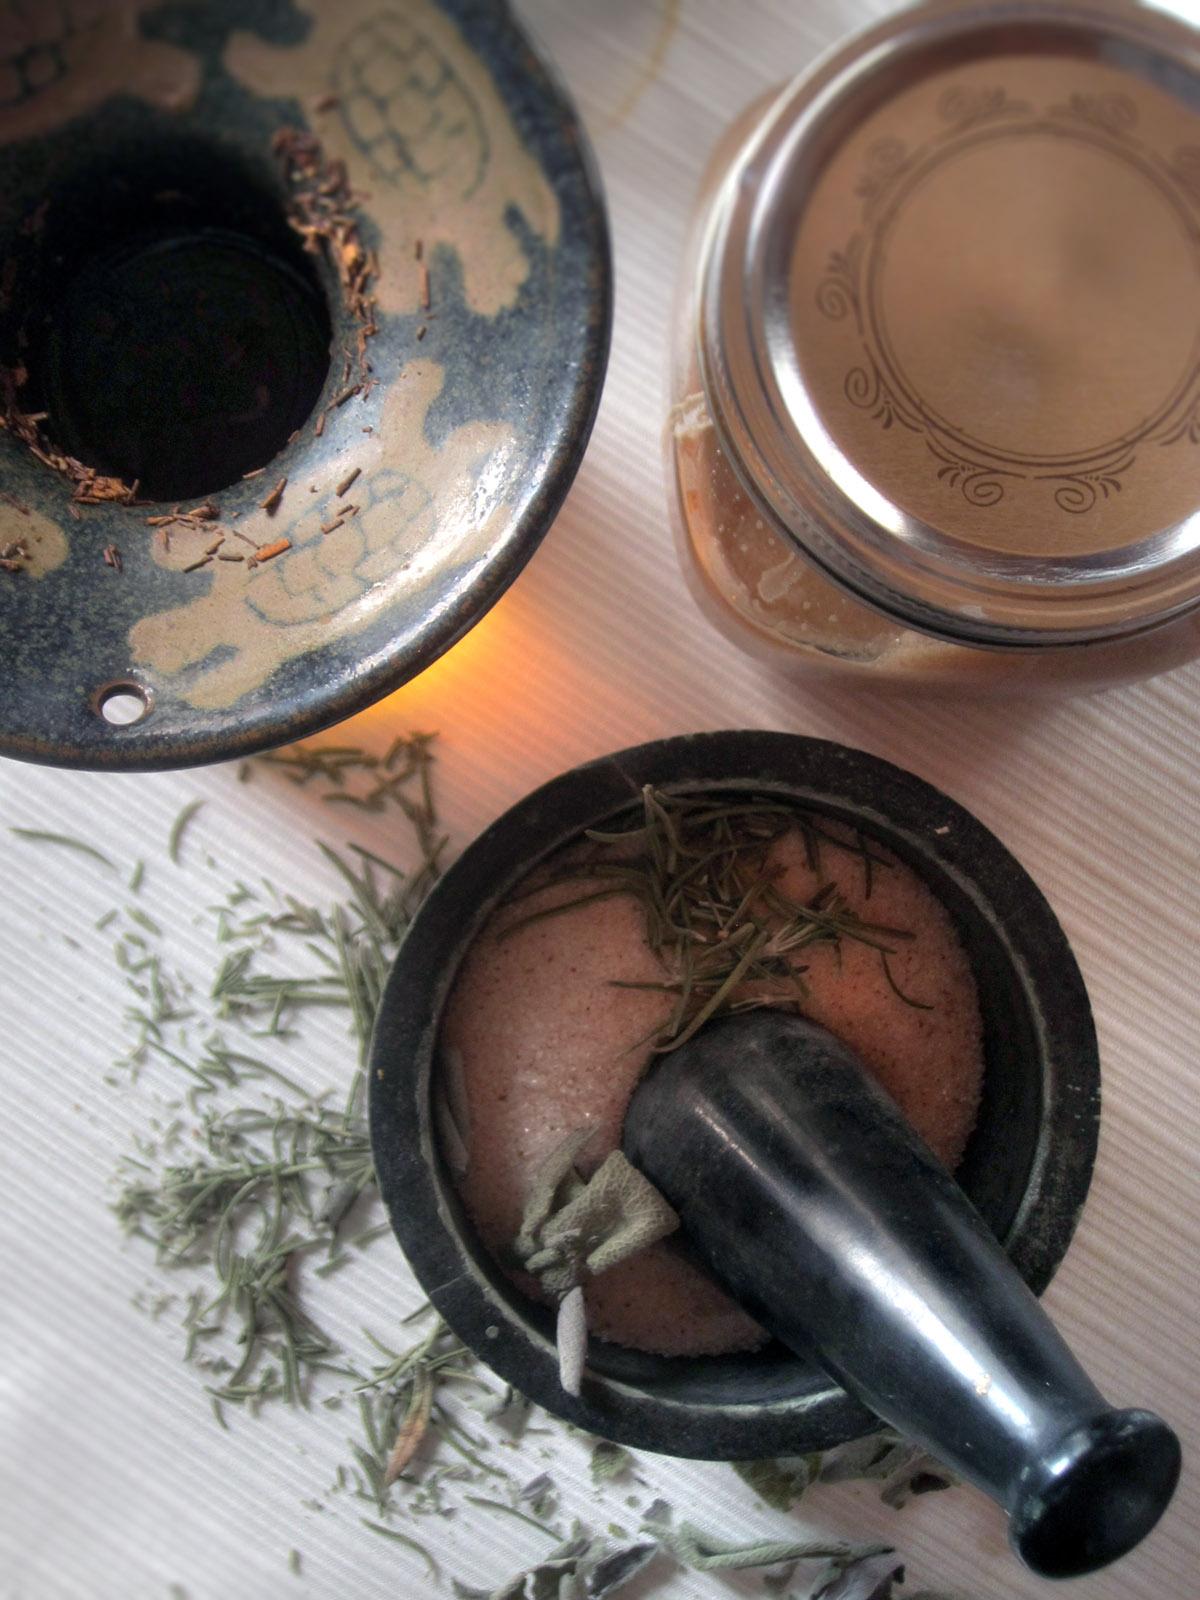 Salt Scrub - Jars and Ingredients (close up)